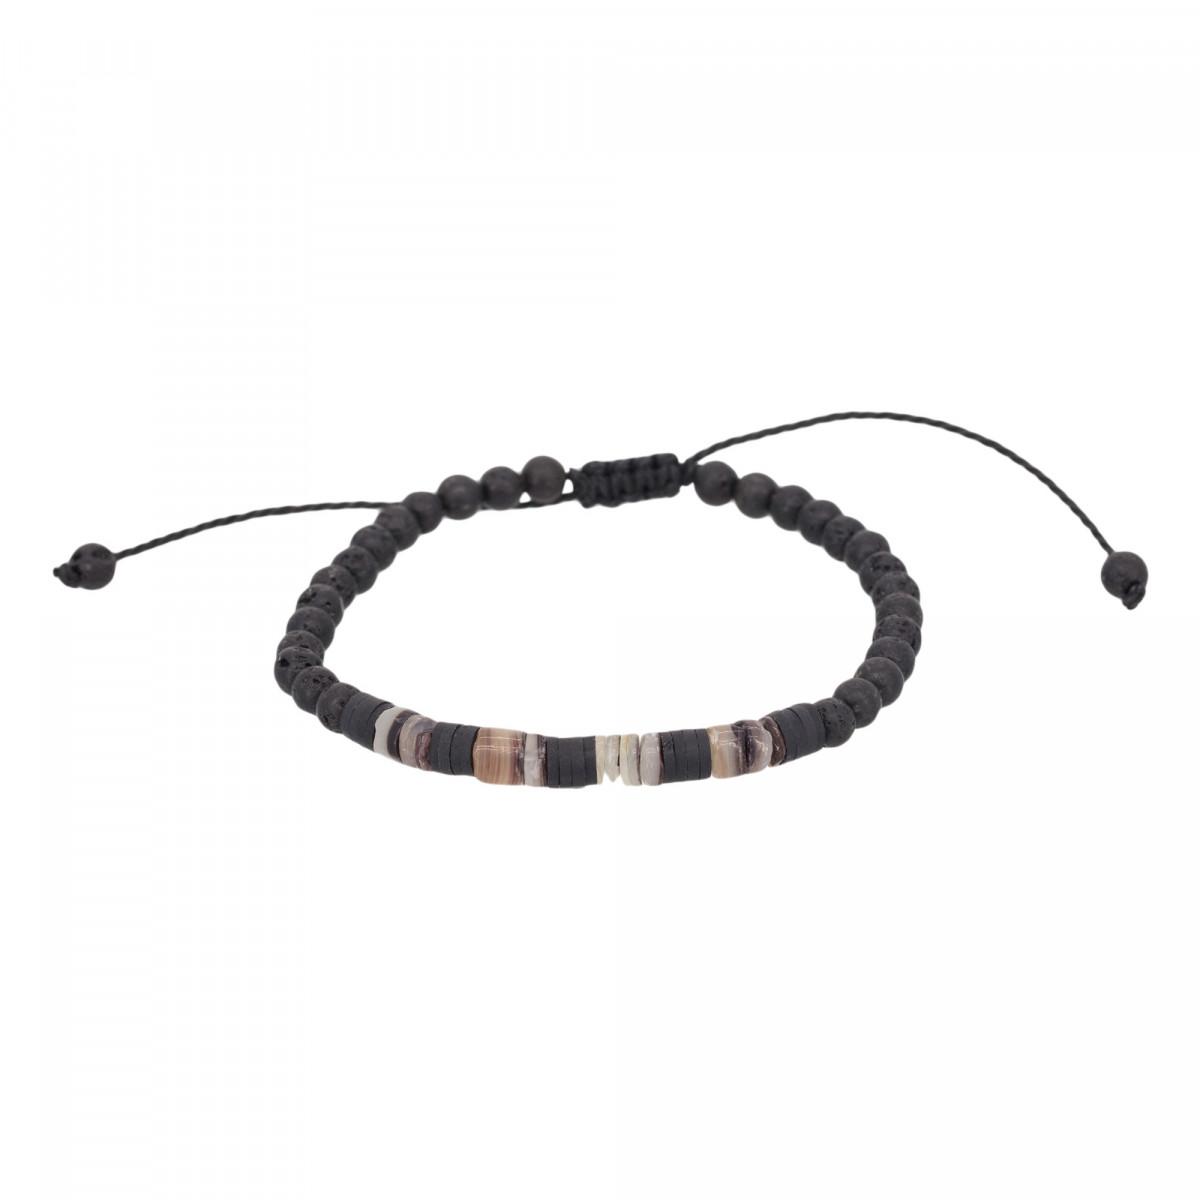 "Bracelet Homme ajustable pierres noires ""ROCK AND SAND"""